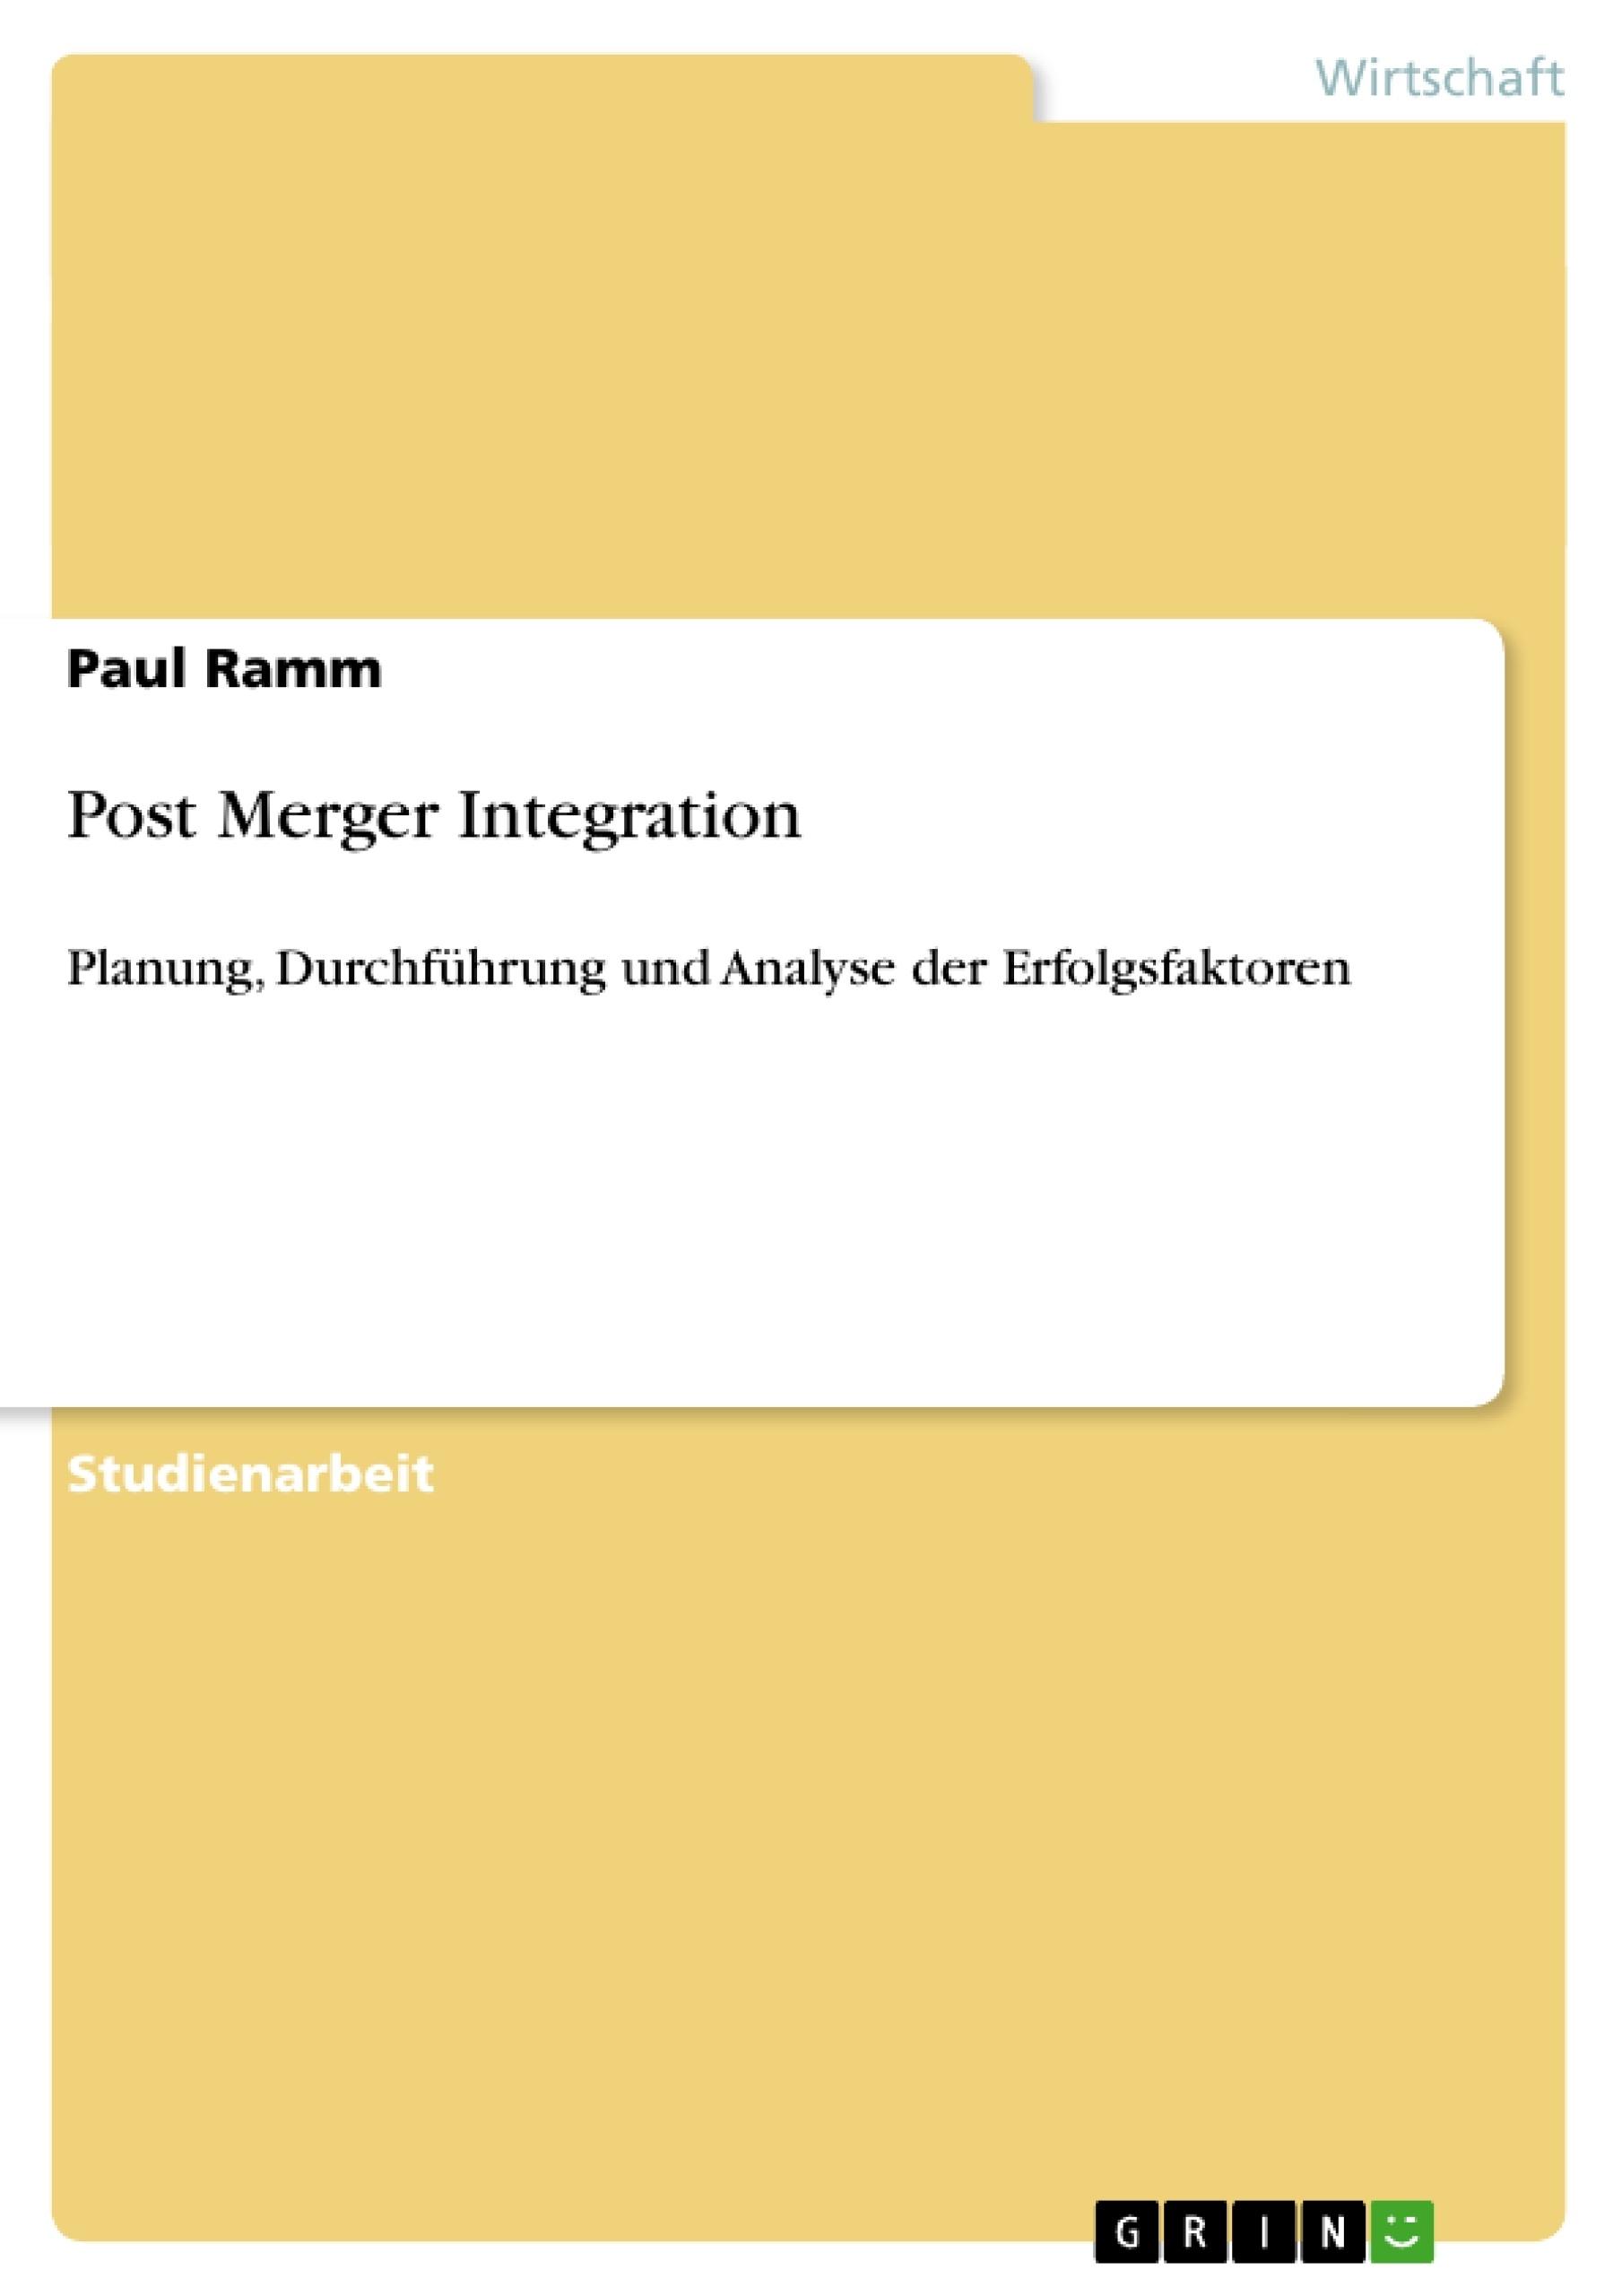 Titel: Post Merger Integration